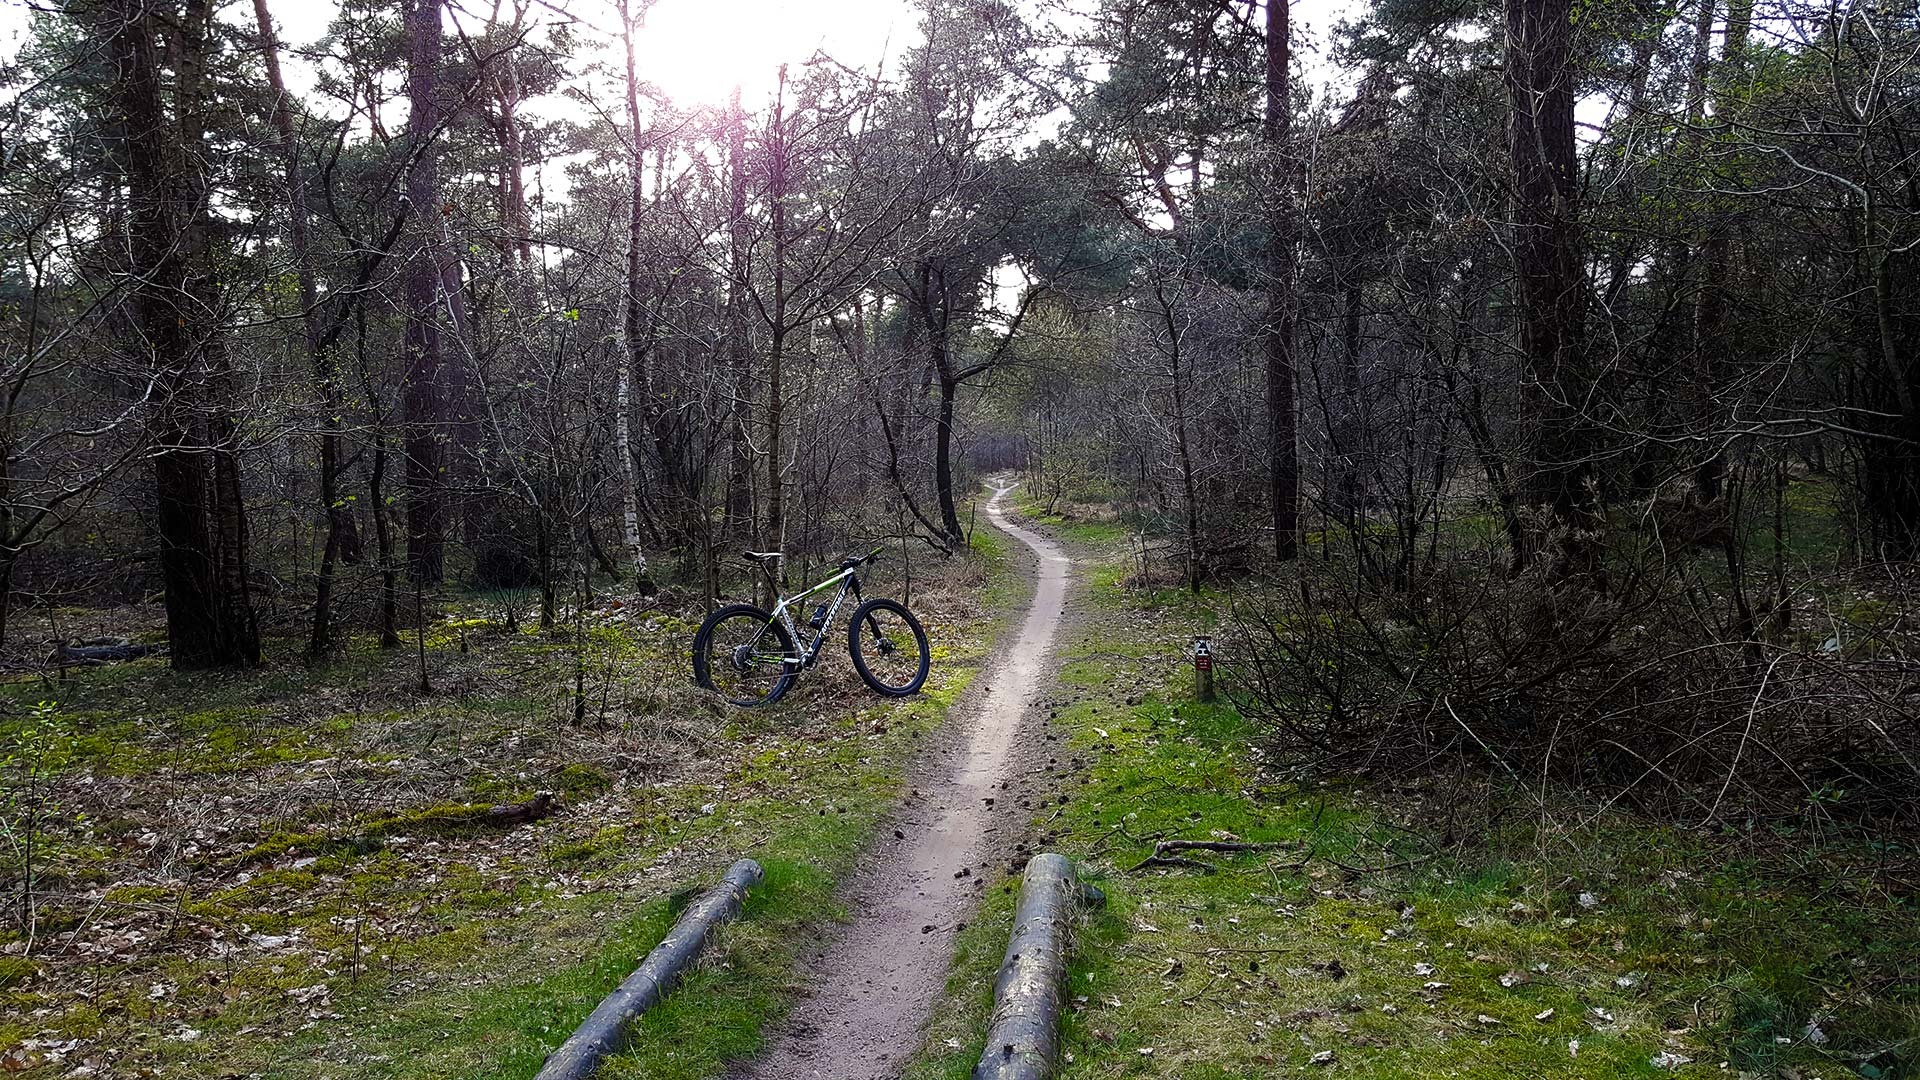 Mountainbikeroute Dorst: 9 kilometer slingerende singletrack